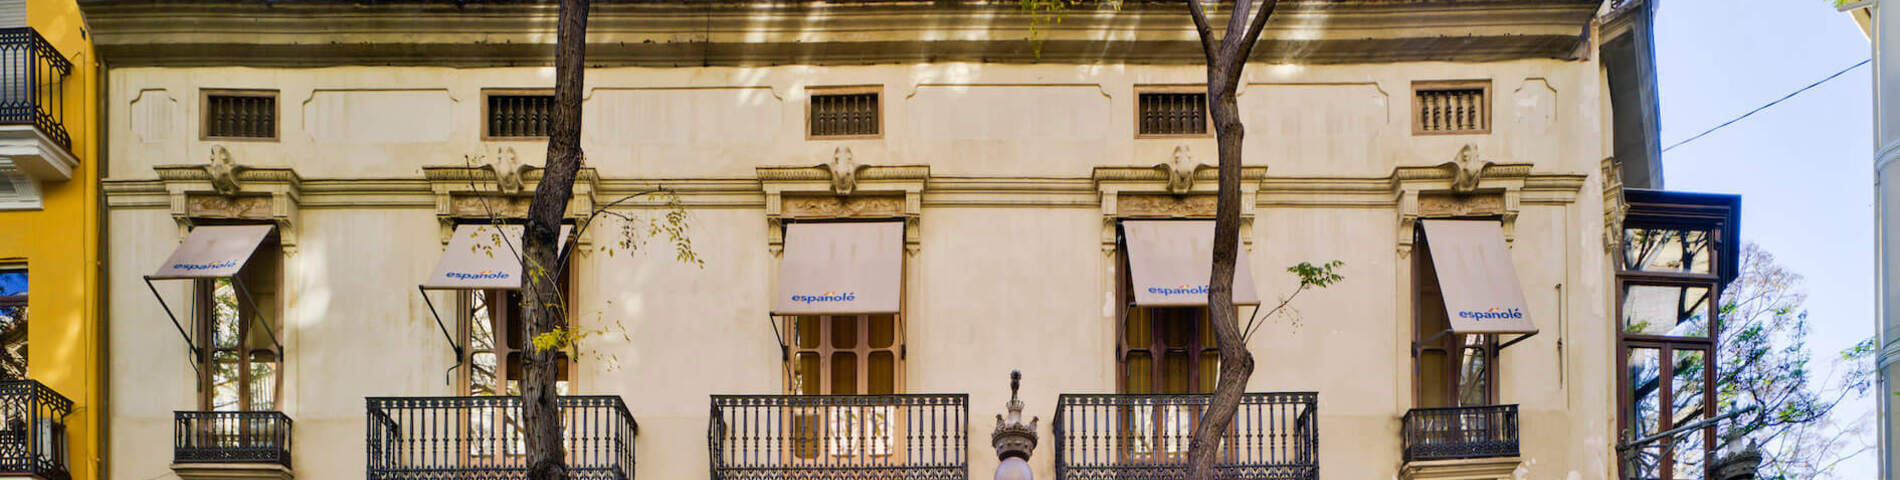 Españole International House resim 1